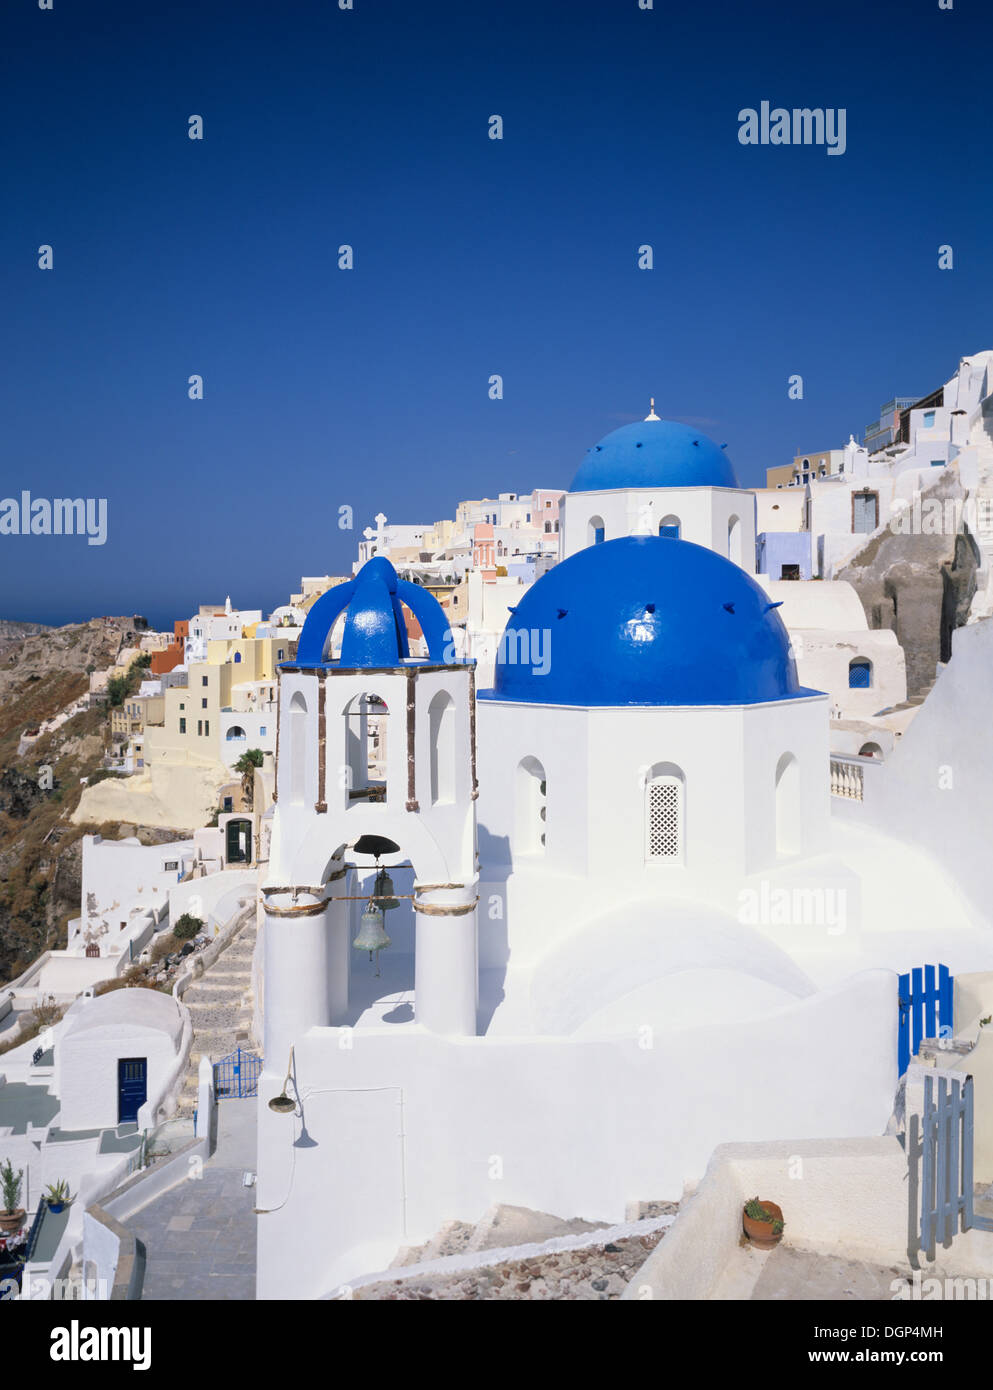 Church with blue cupolas, Oia, Santorini, Cyclades, Greece, Europe - Stock Image